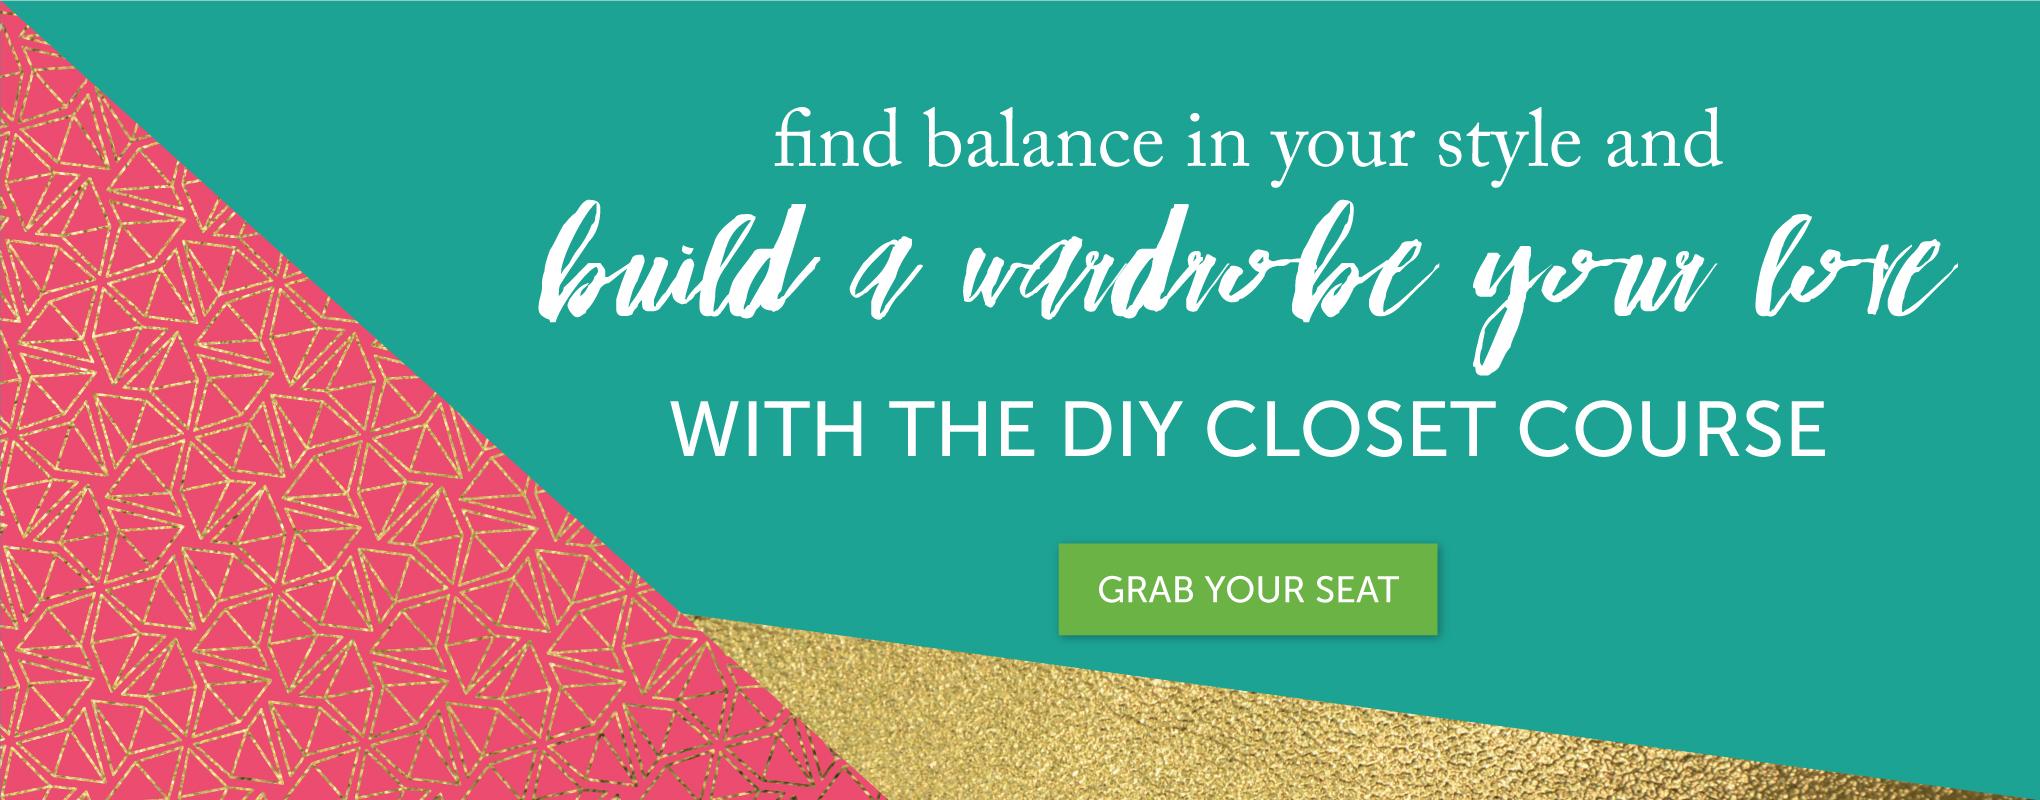 Take the DIY Closet Course